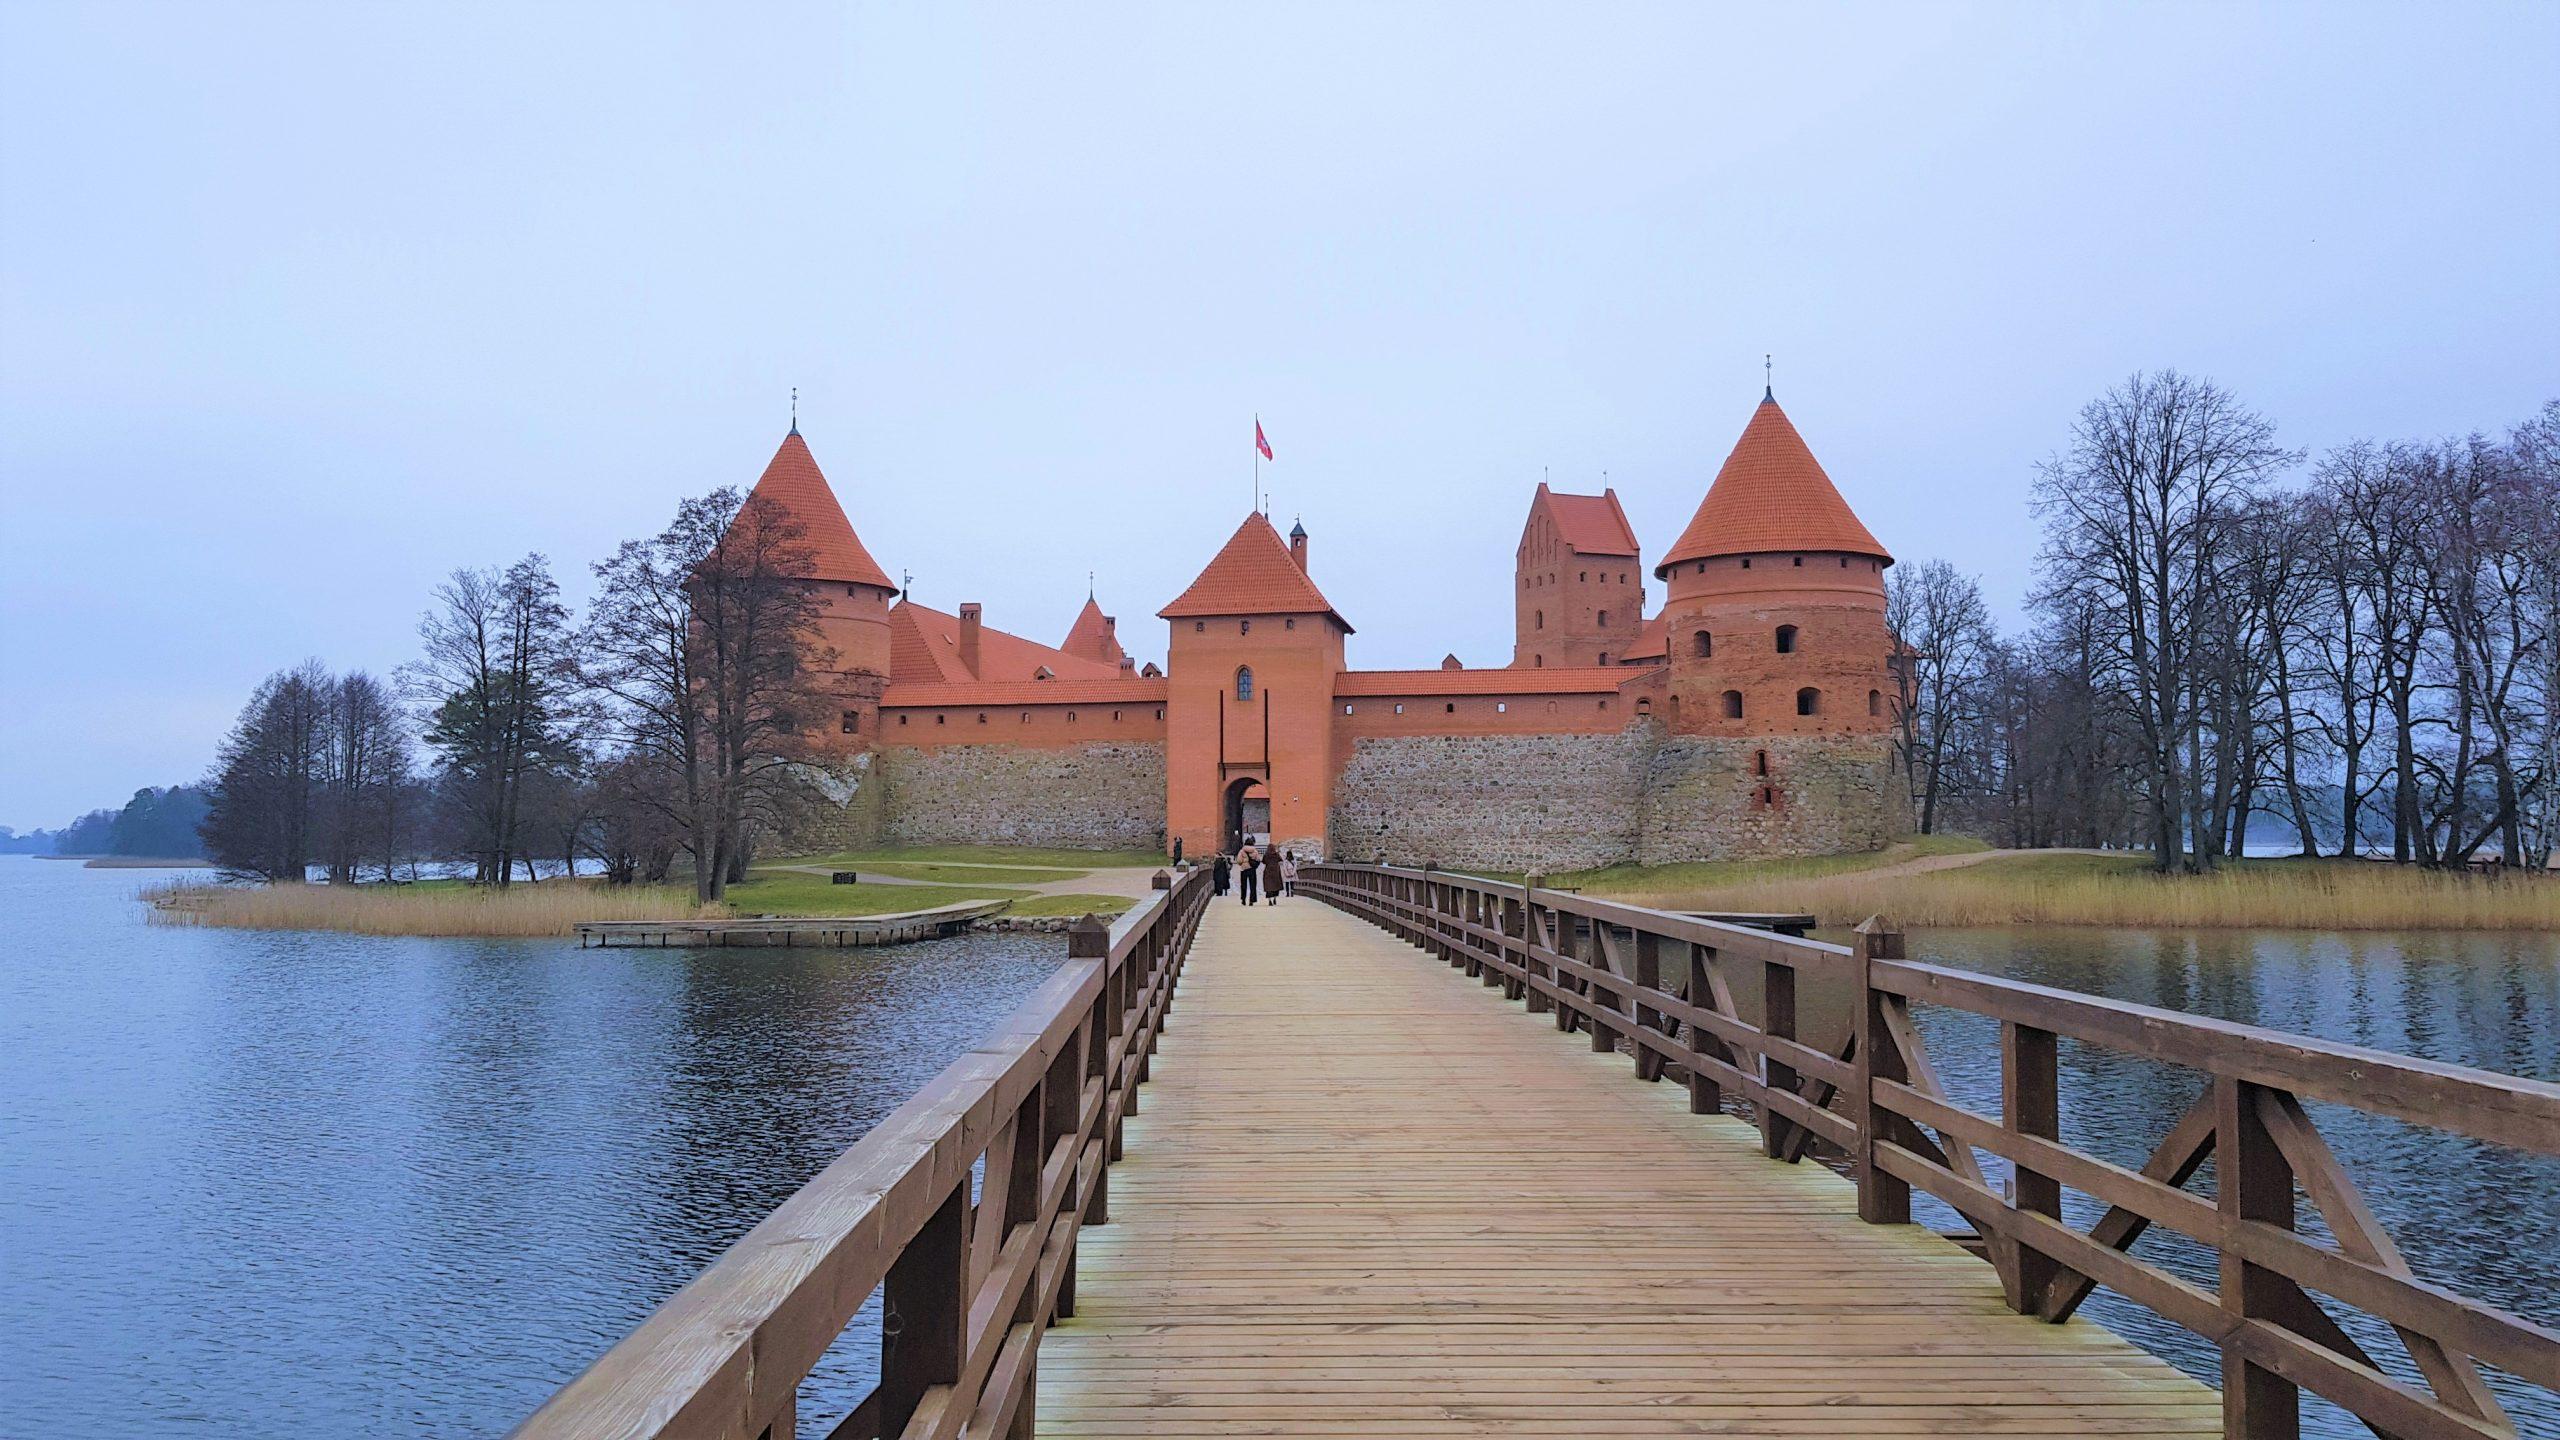 Escapada al castillo de Trakai